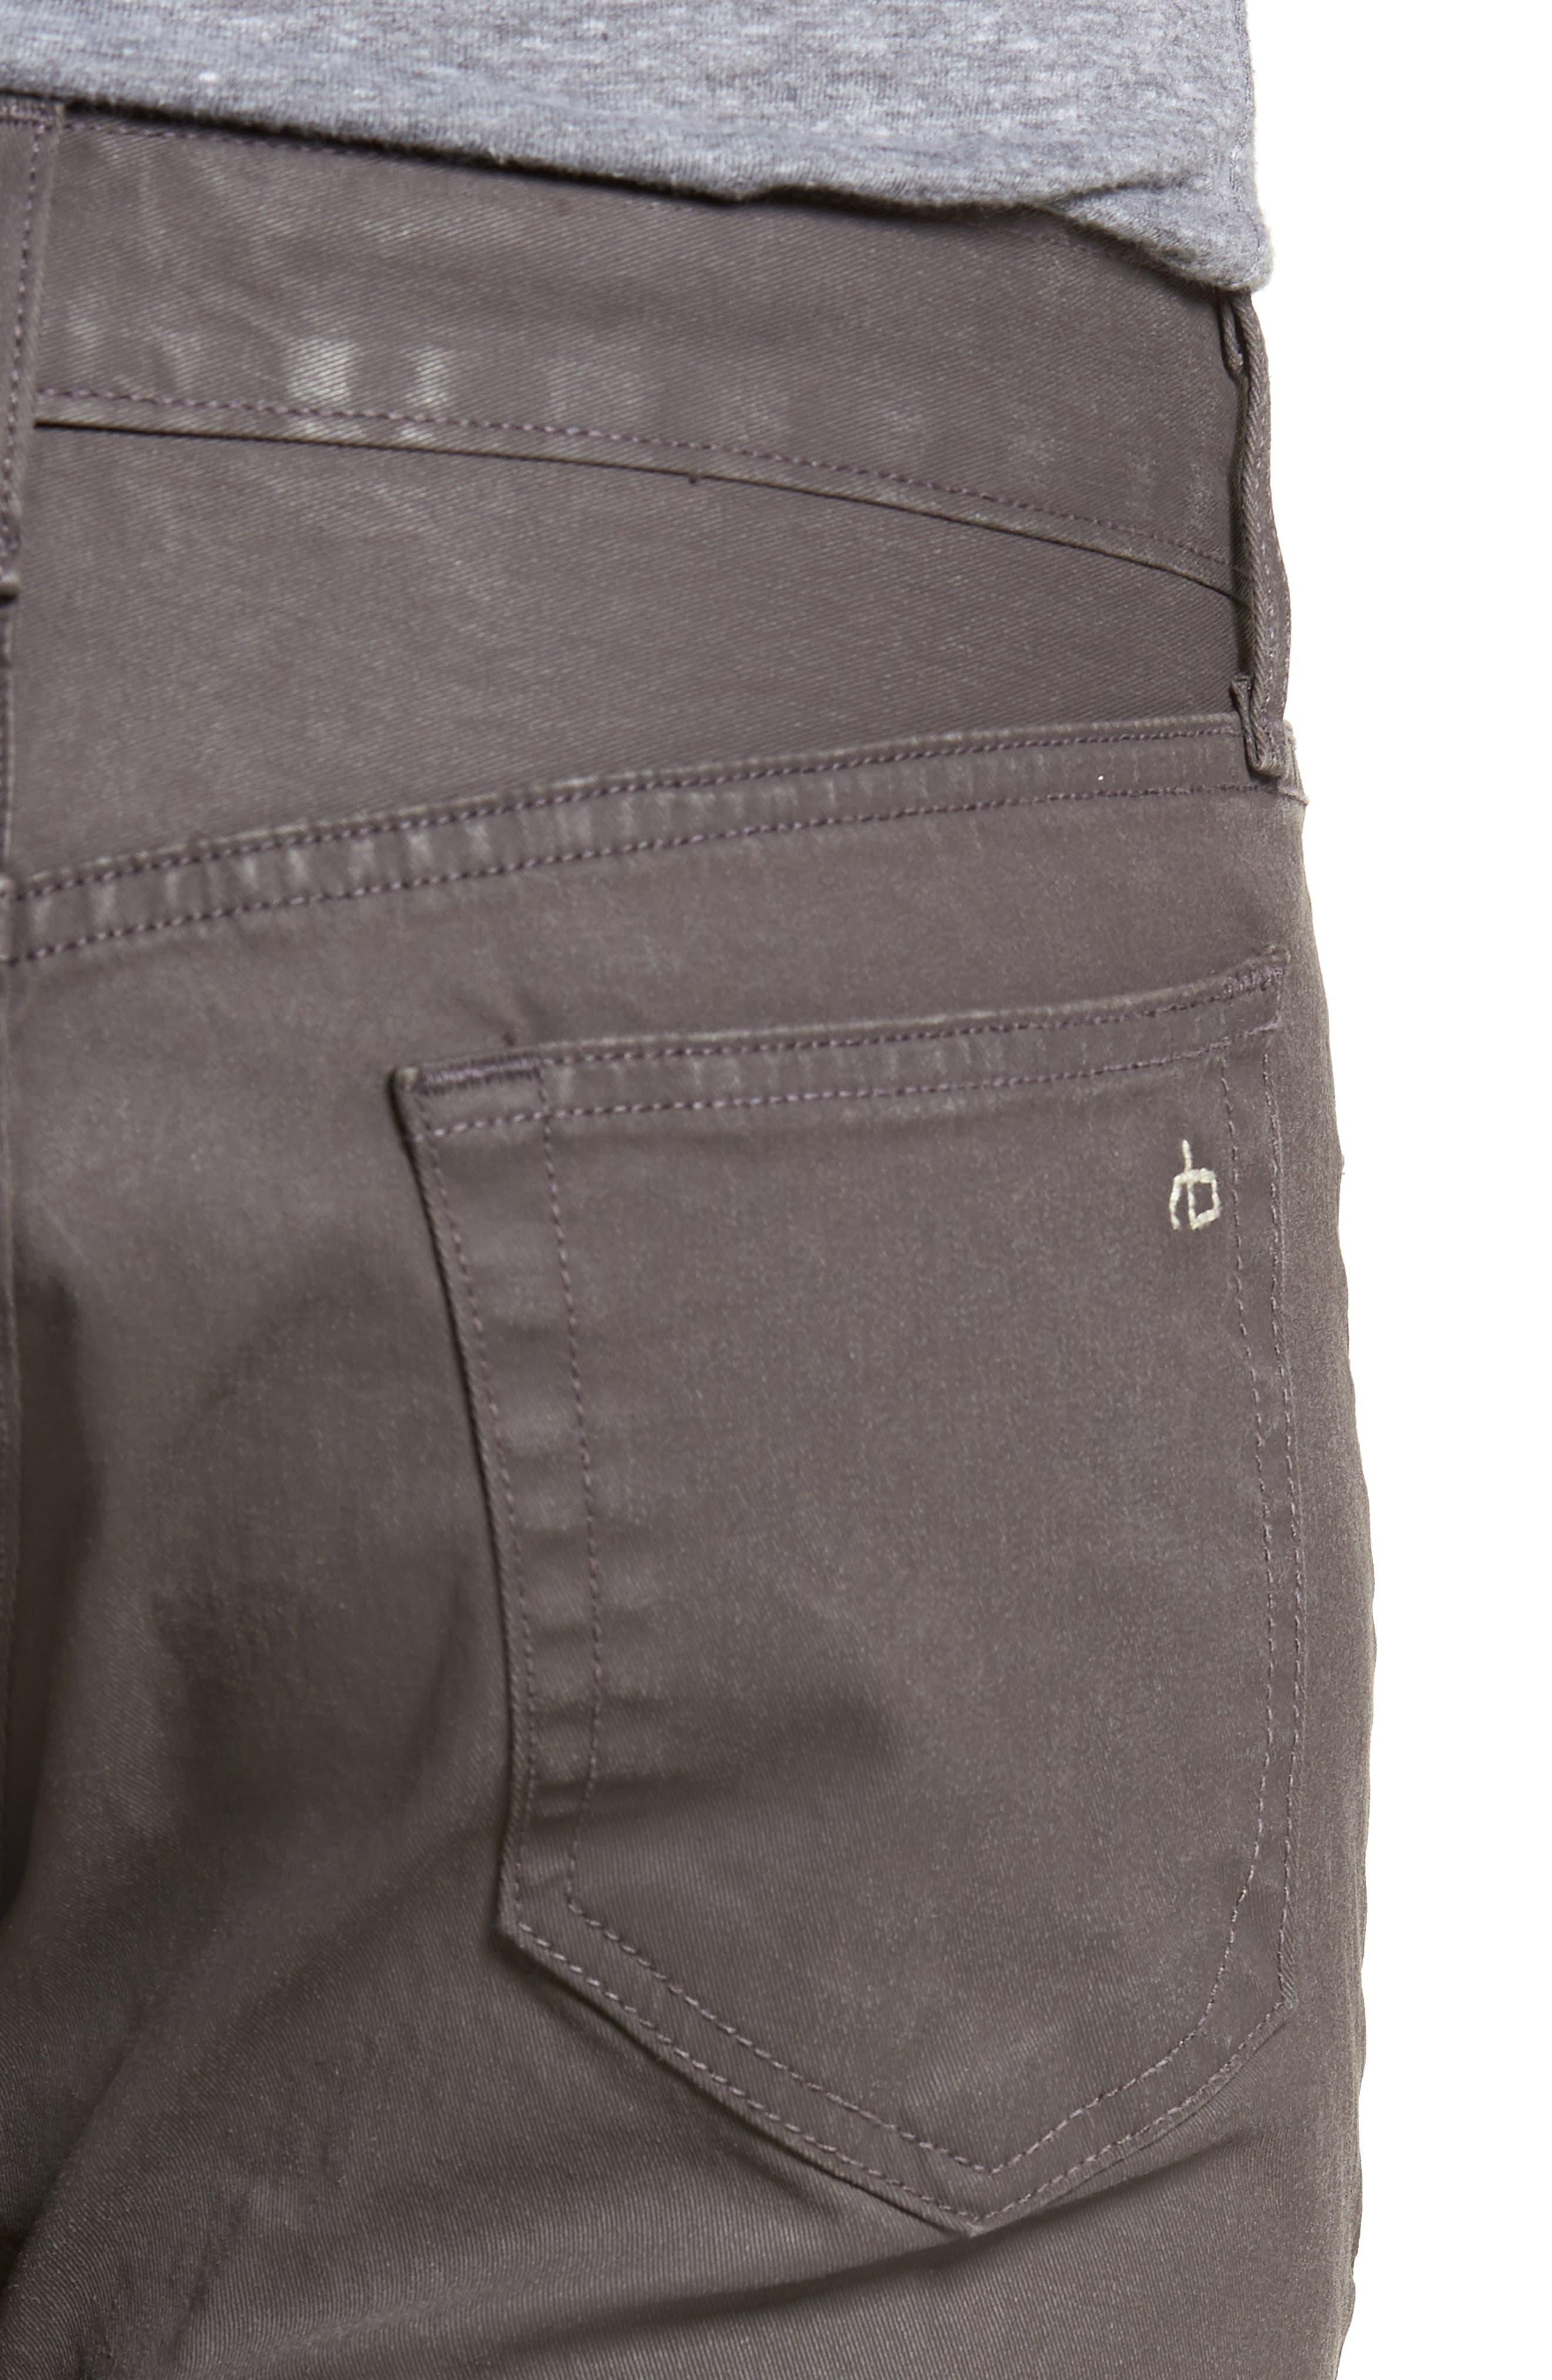 RAG & BONE, Fit 2 Slim Fit Pants, Alternate thumbnail 4, color, 020